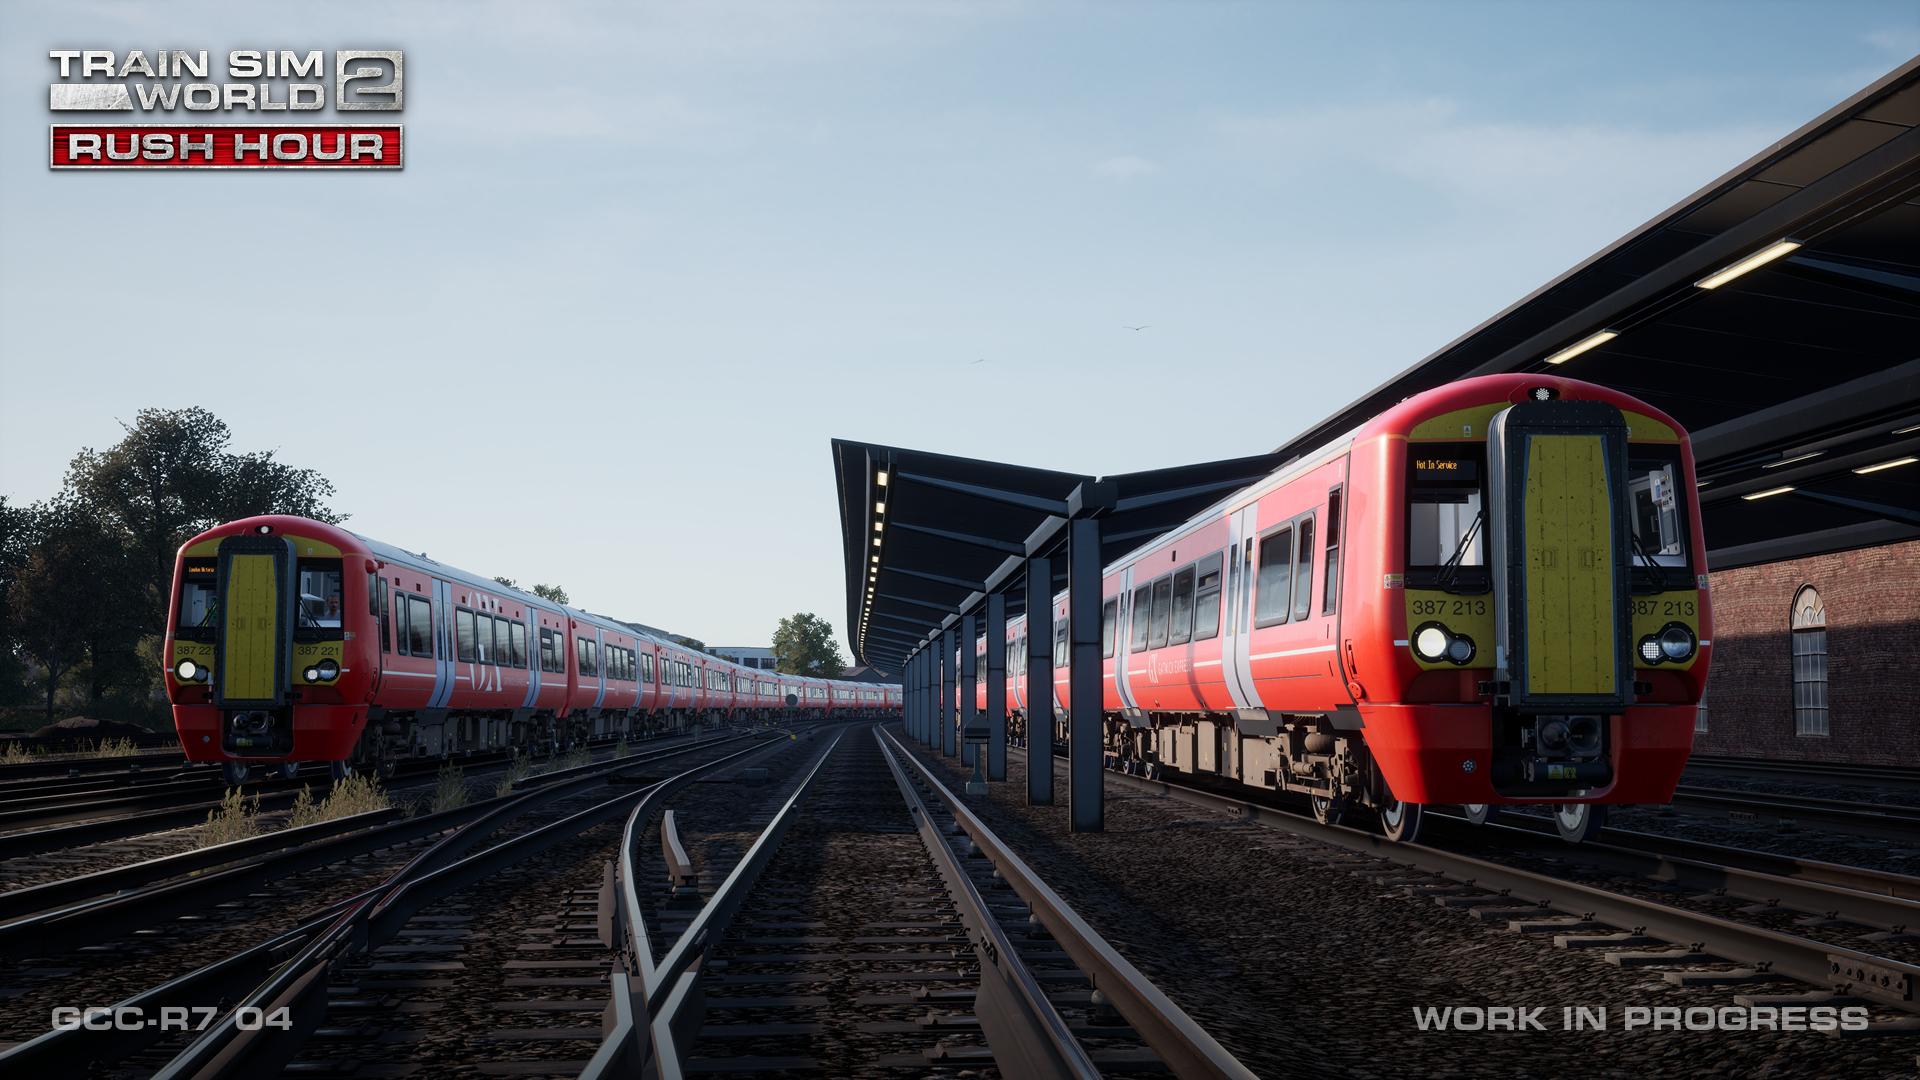 TSW2_RushHour_LondonCommuter_firstscreens5.jpg